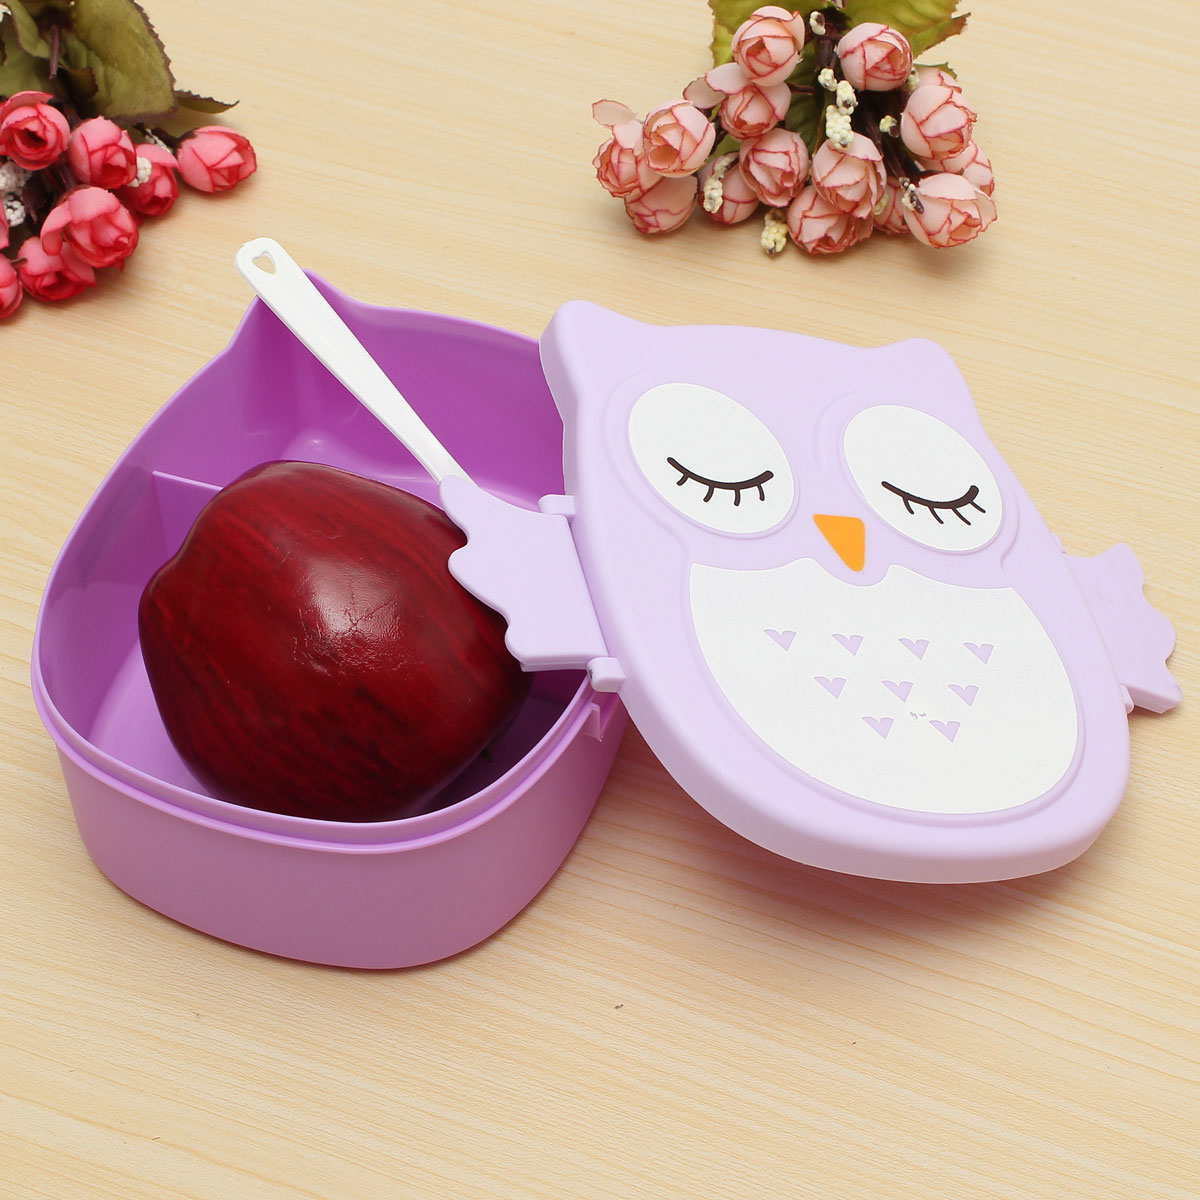 owl lunch bento box plastic cartoon lunch box food container bento box purple. Black Bedroom Furniture Sets. Home Design Ideas